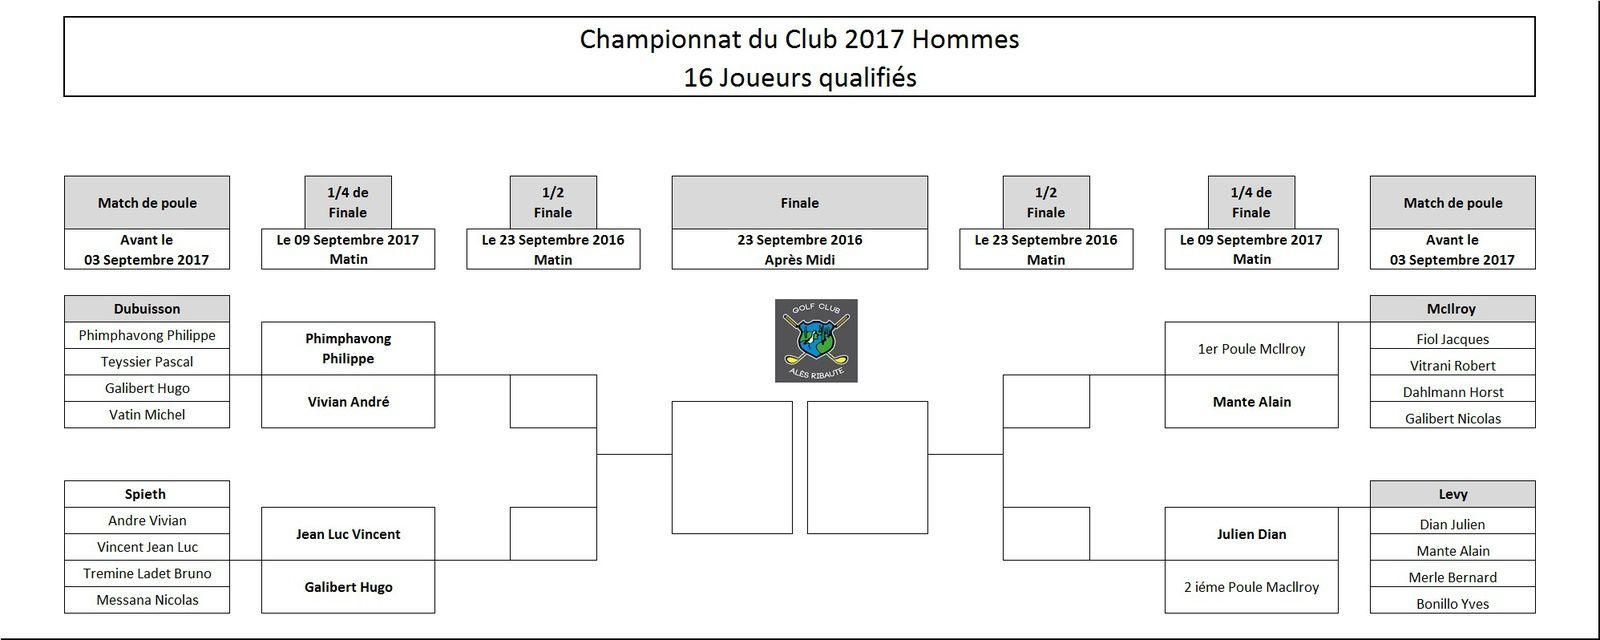 Championnat du Club 2017